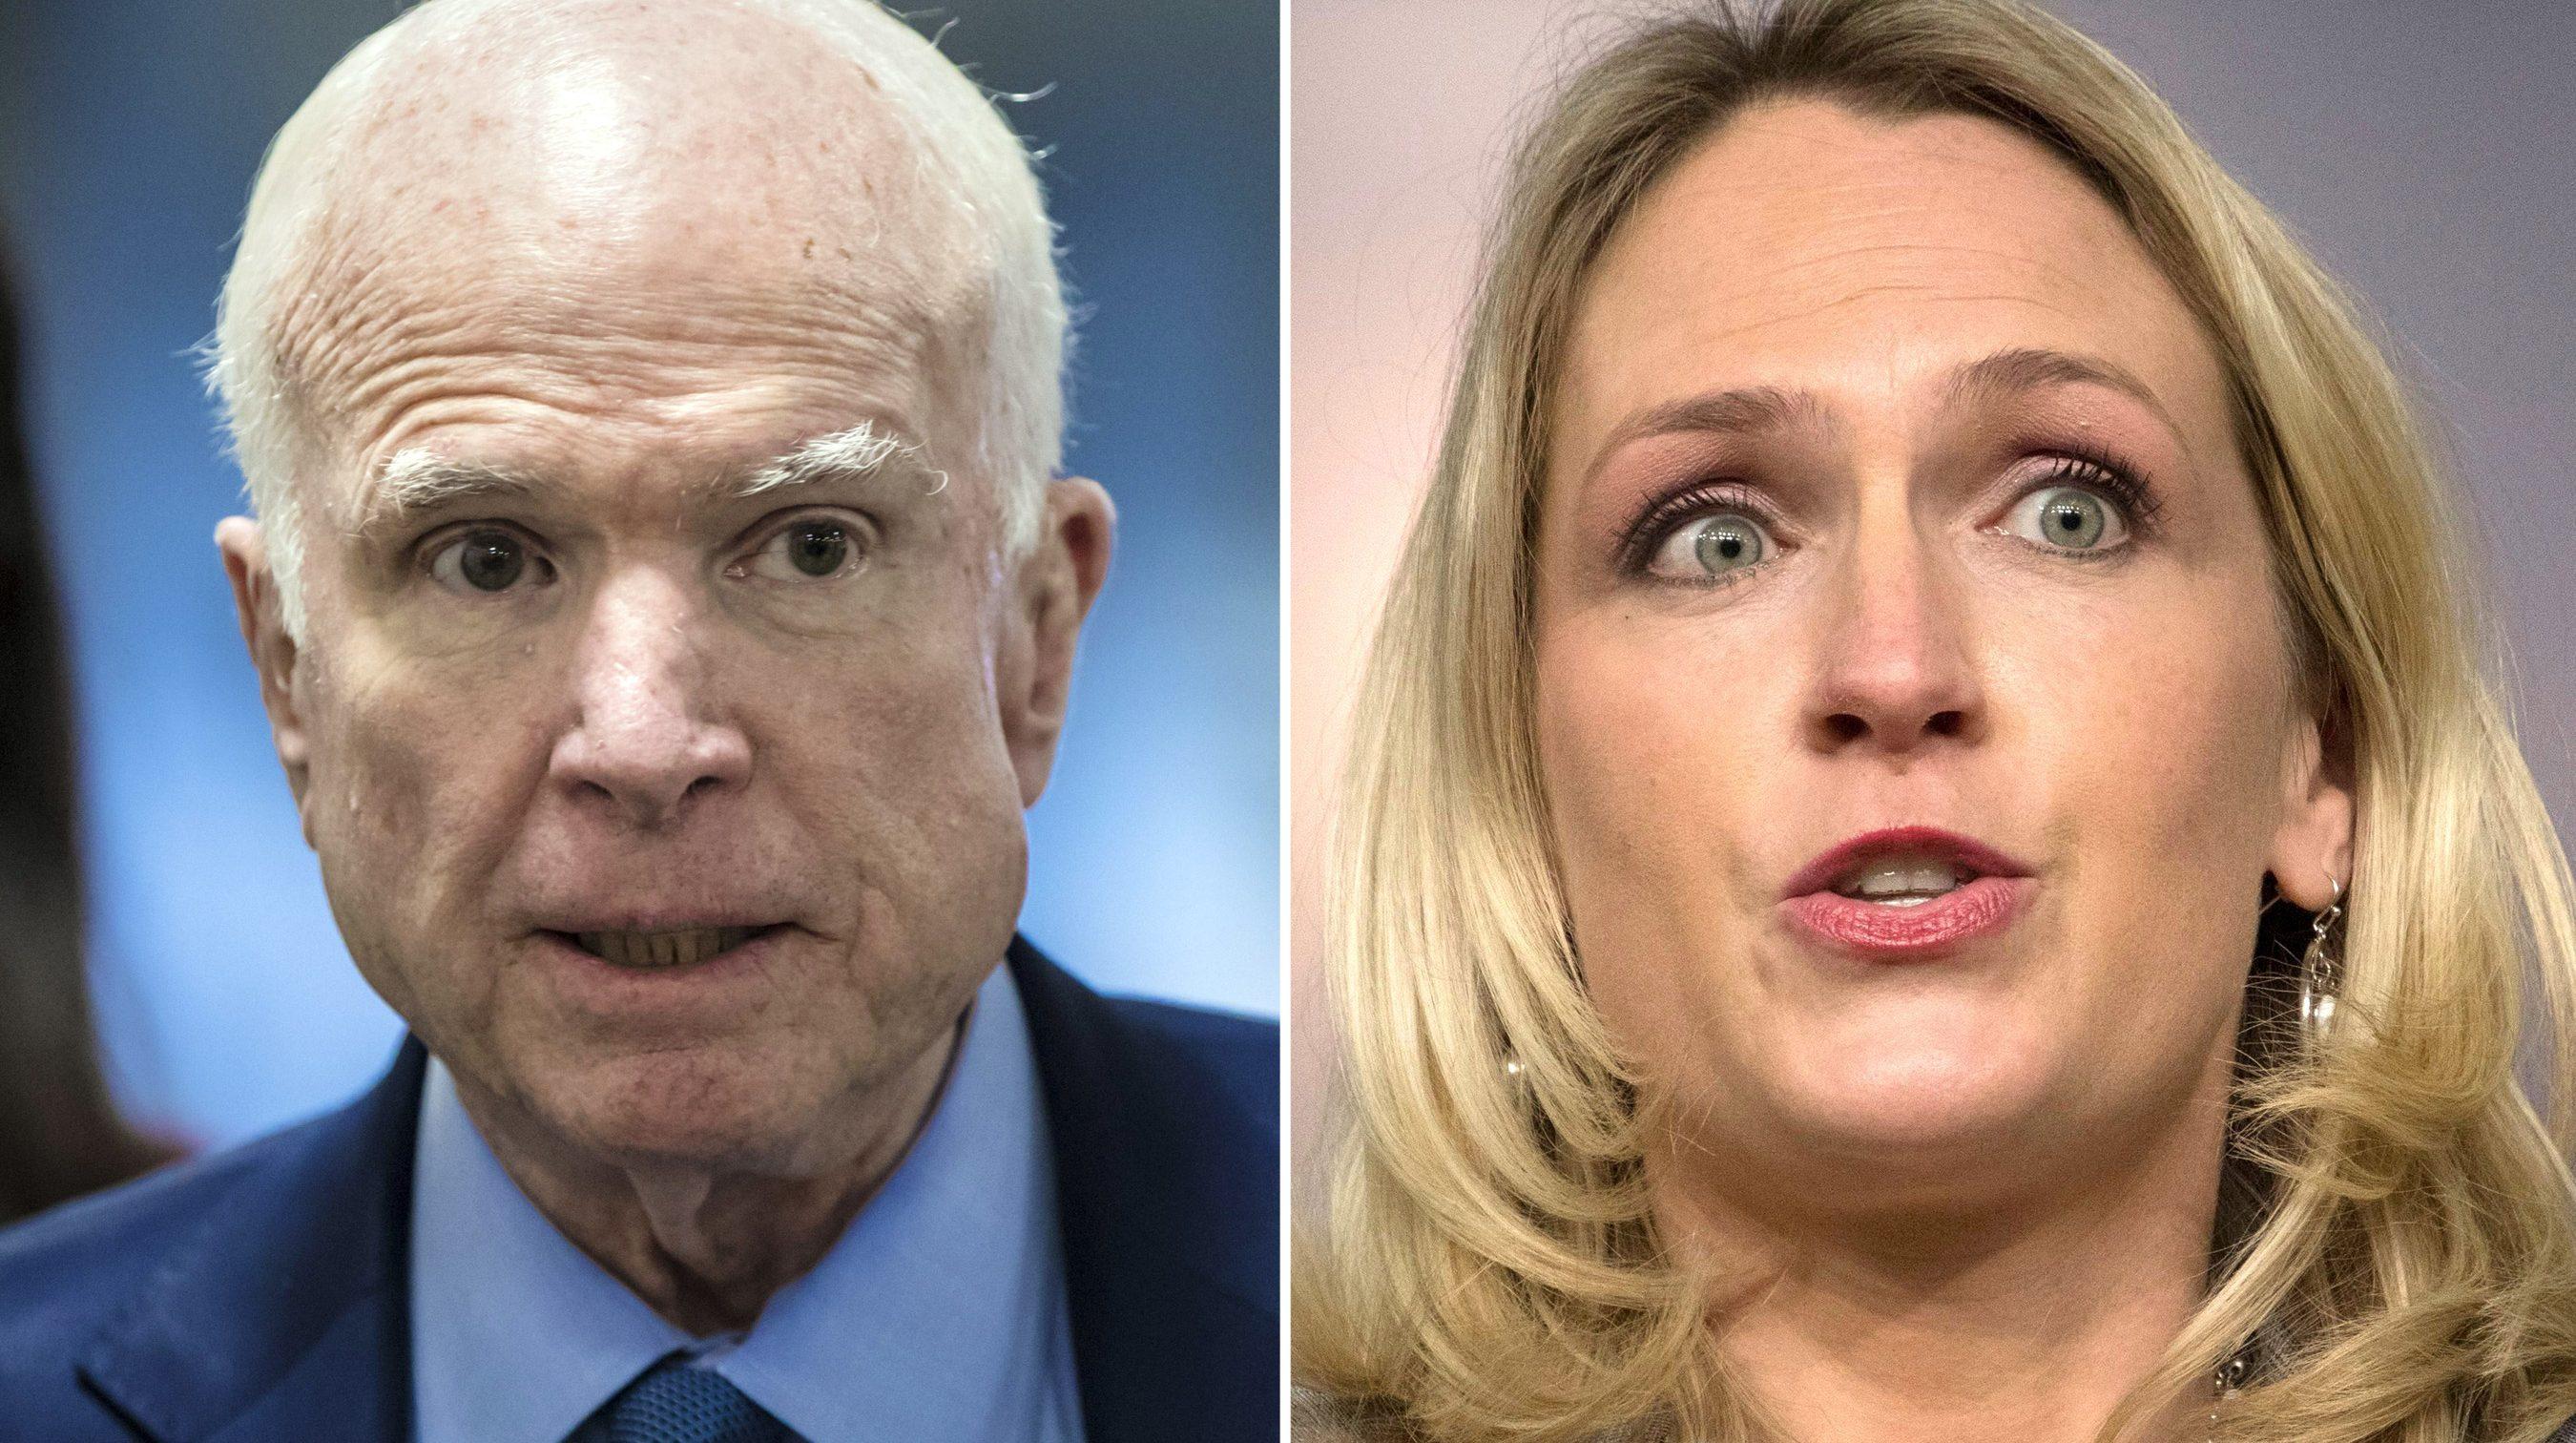 Kelly Sadler: Aide who mocked McCain exits White House